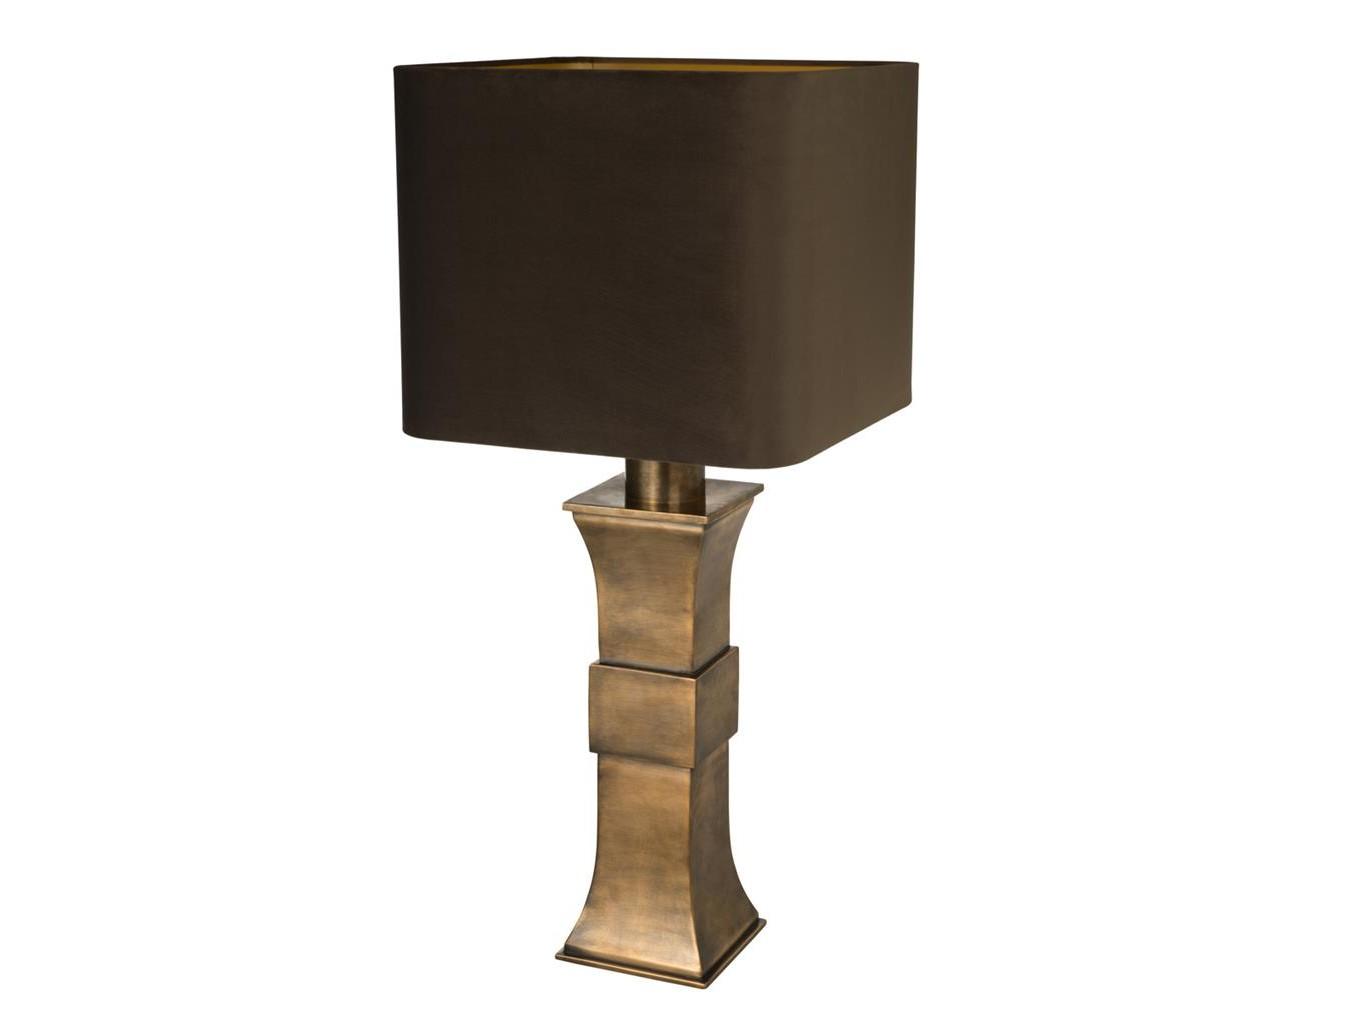 Настольная лампа AviaДекоративные лампы<br>&amp;lt;div&amp;gt;Вид цоколя: E27&amp;lt;/div&amp;gt;&amp;lt;div&amp;gt;Мощность:&amp;amp;nbsp; 40W&amp;lt;/div&amp;gt;&amp;lt;div&amp;gt;Количество ламп: 1 (нет в комплекте)&amp;lt;/div&amp;gt;<br><br>Material: Металл<br>Ширина см: 35.0<br>Высота см: 35.0<br>Глубина см: 81.0